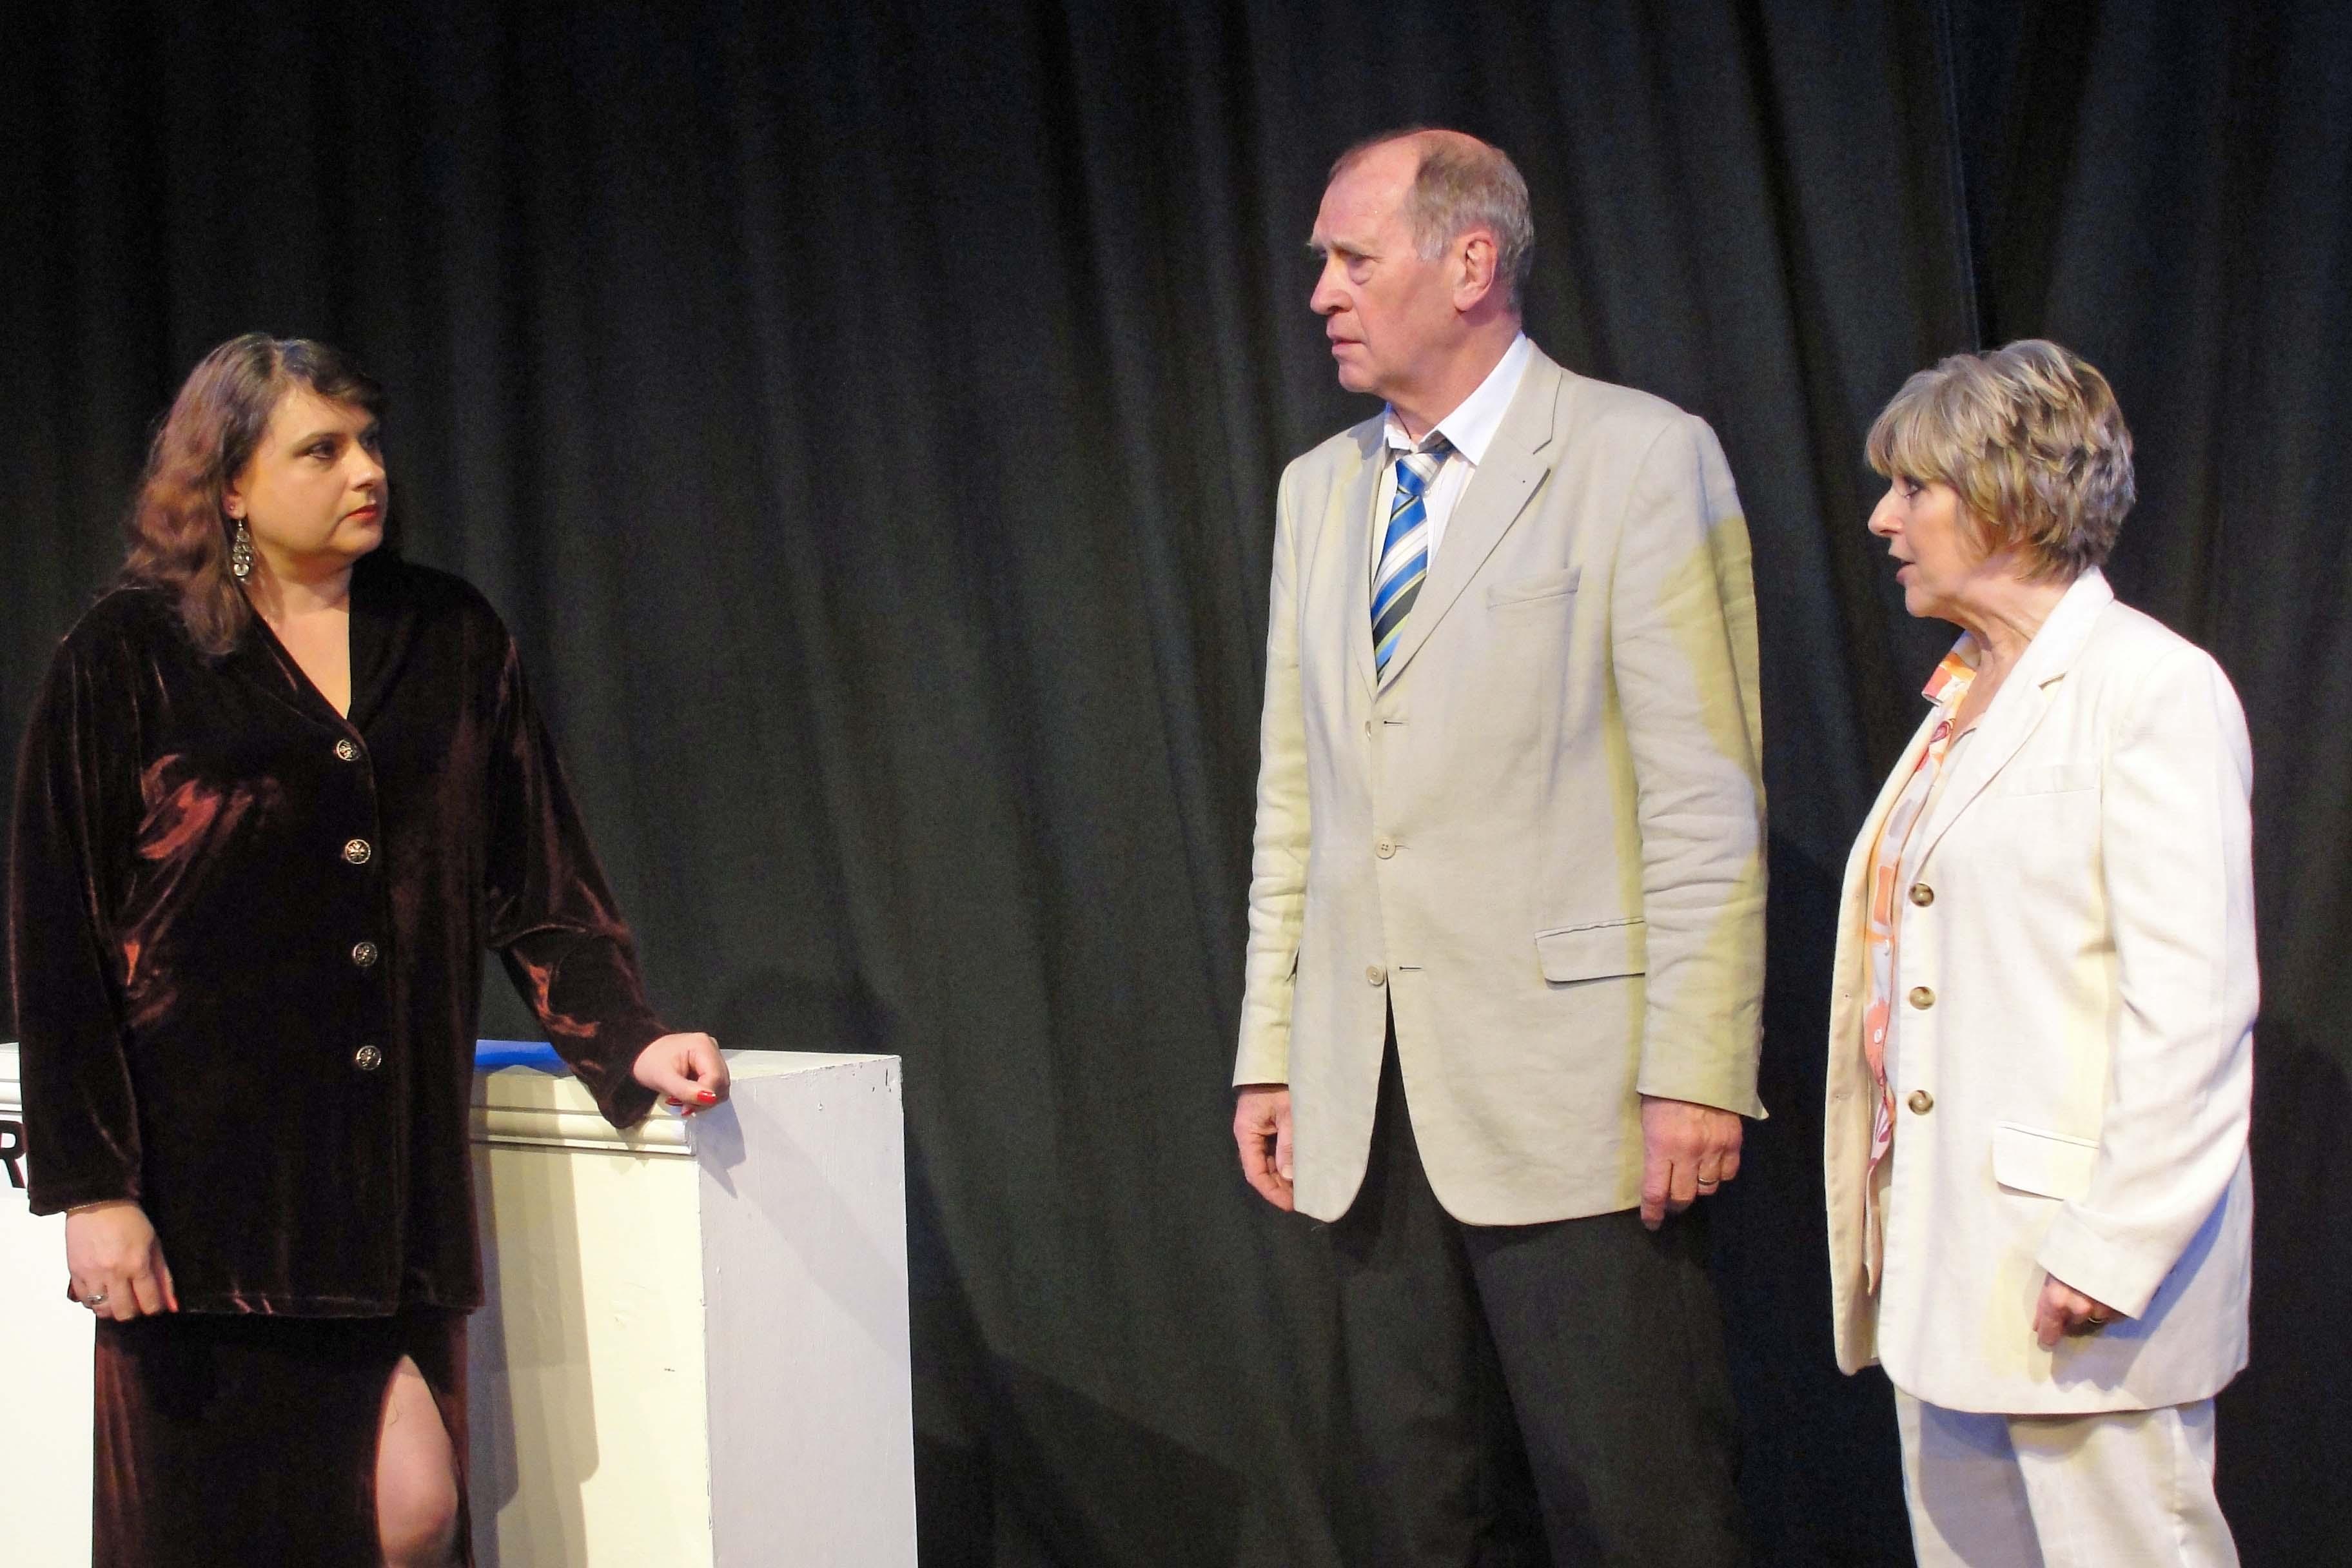 201210 Last Tango in Whitby (28)